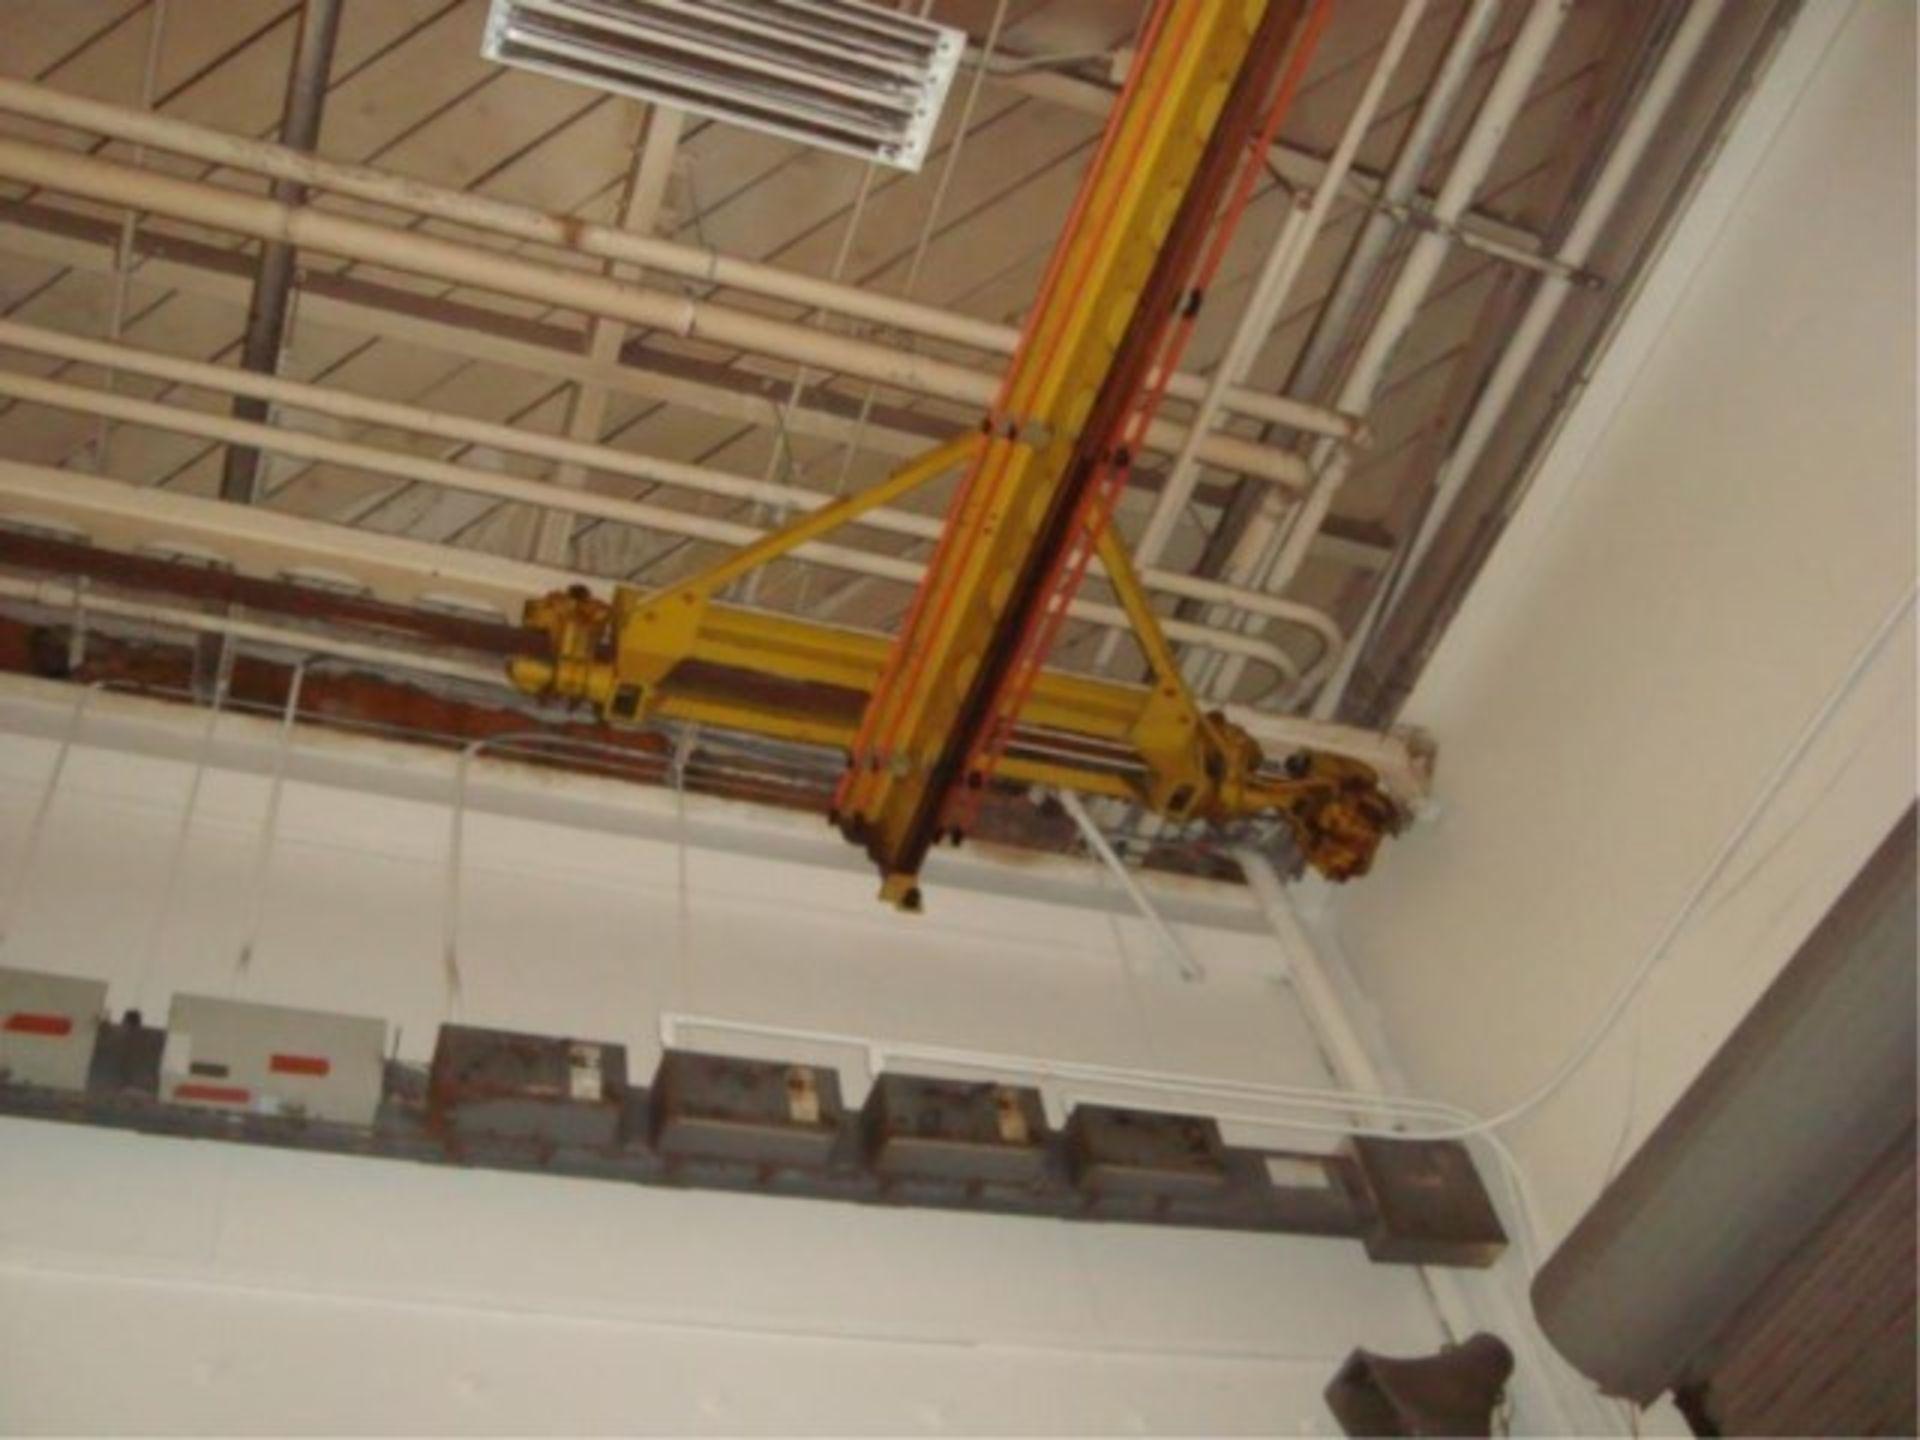 Lot 113 - 5-Ton Capacity Overhead Bridge Crane